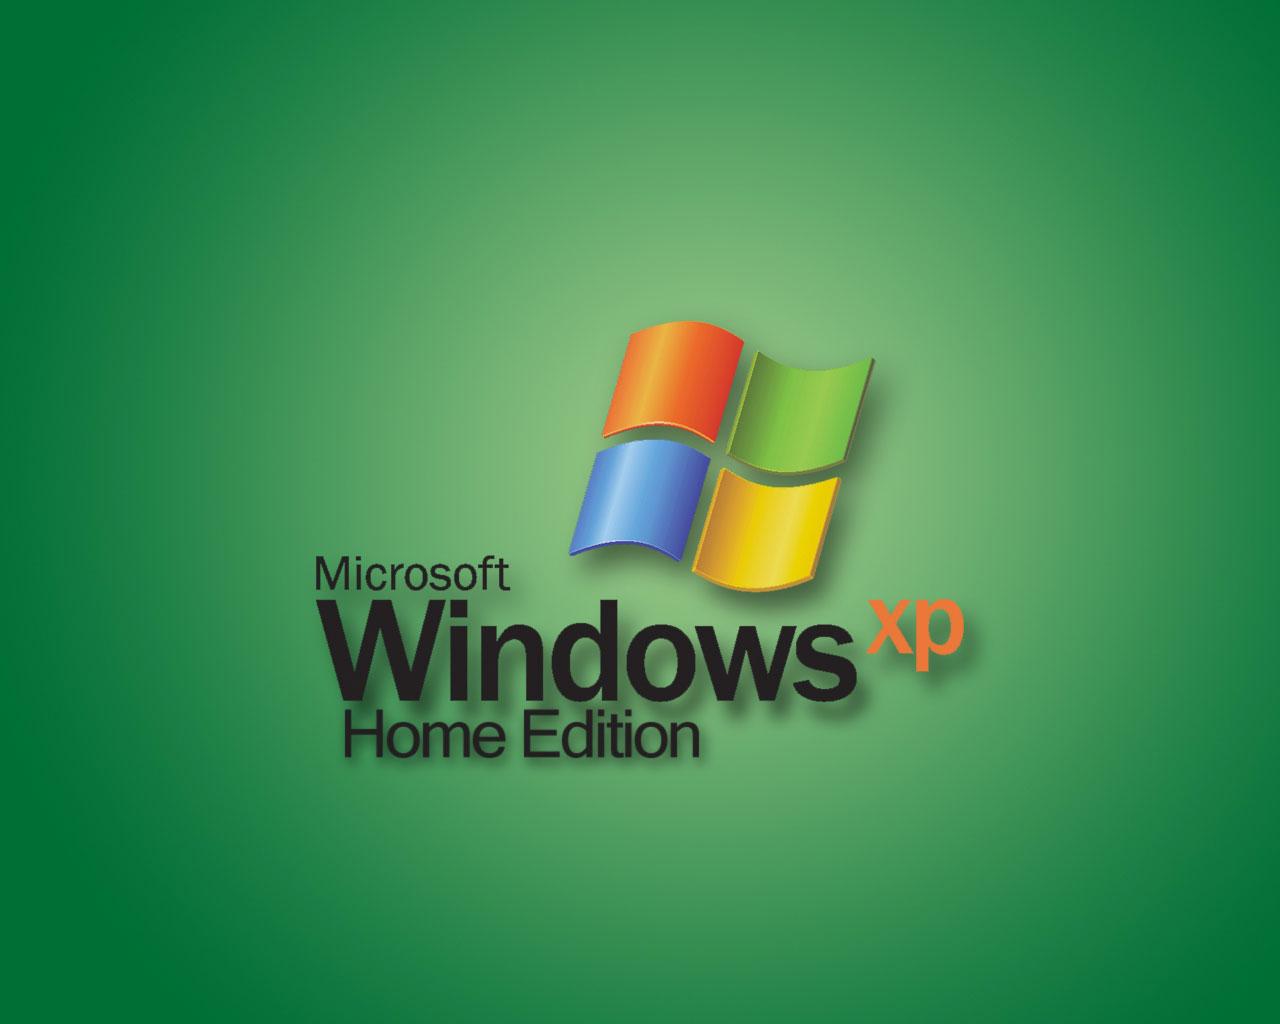 http://1.bp.blogspot.com/-giLq9ZtrHcQ/T91u3VVeX-I/AAAAAAAACQ8/pZiVI_UtQCo/s1600/XPHome_logo3.jpg